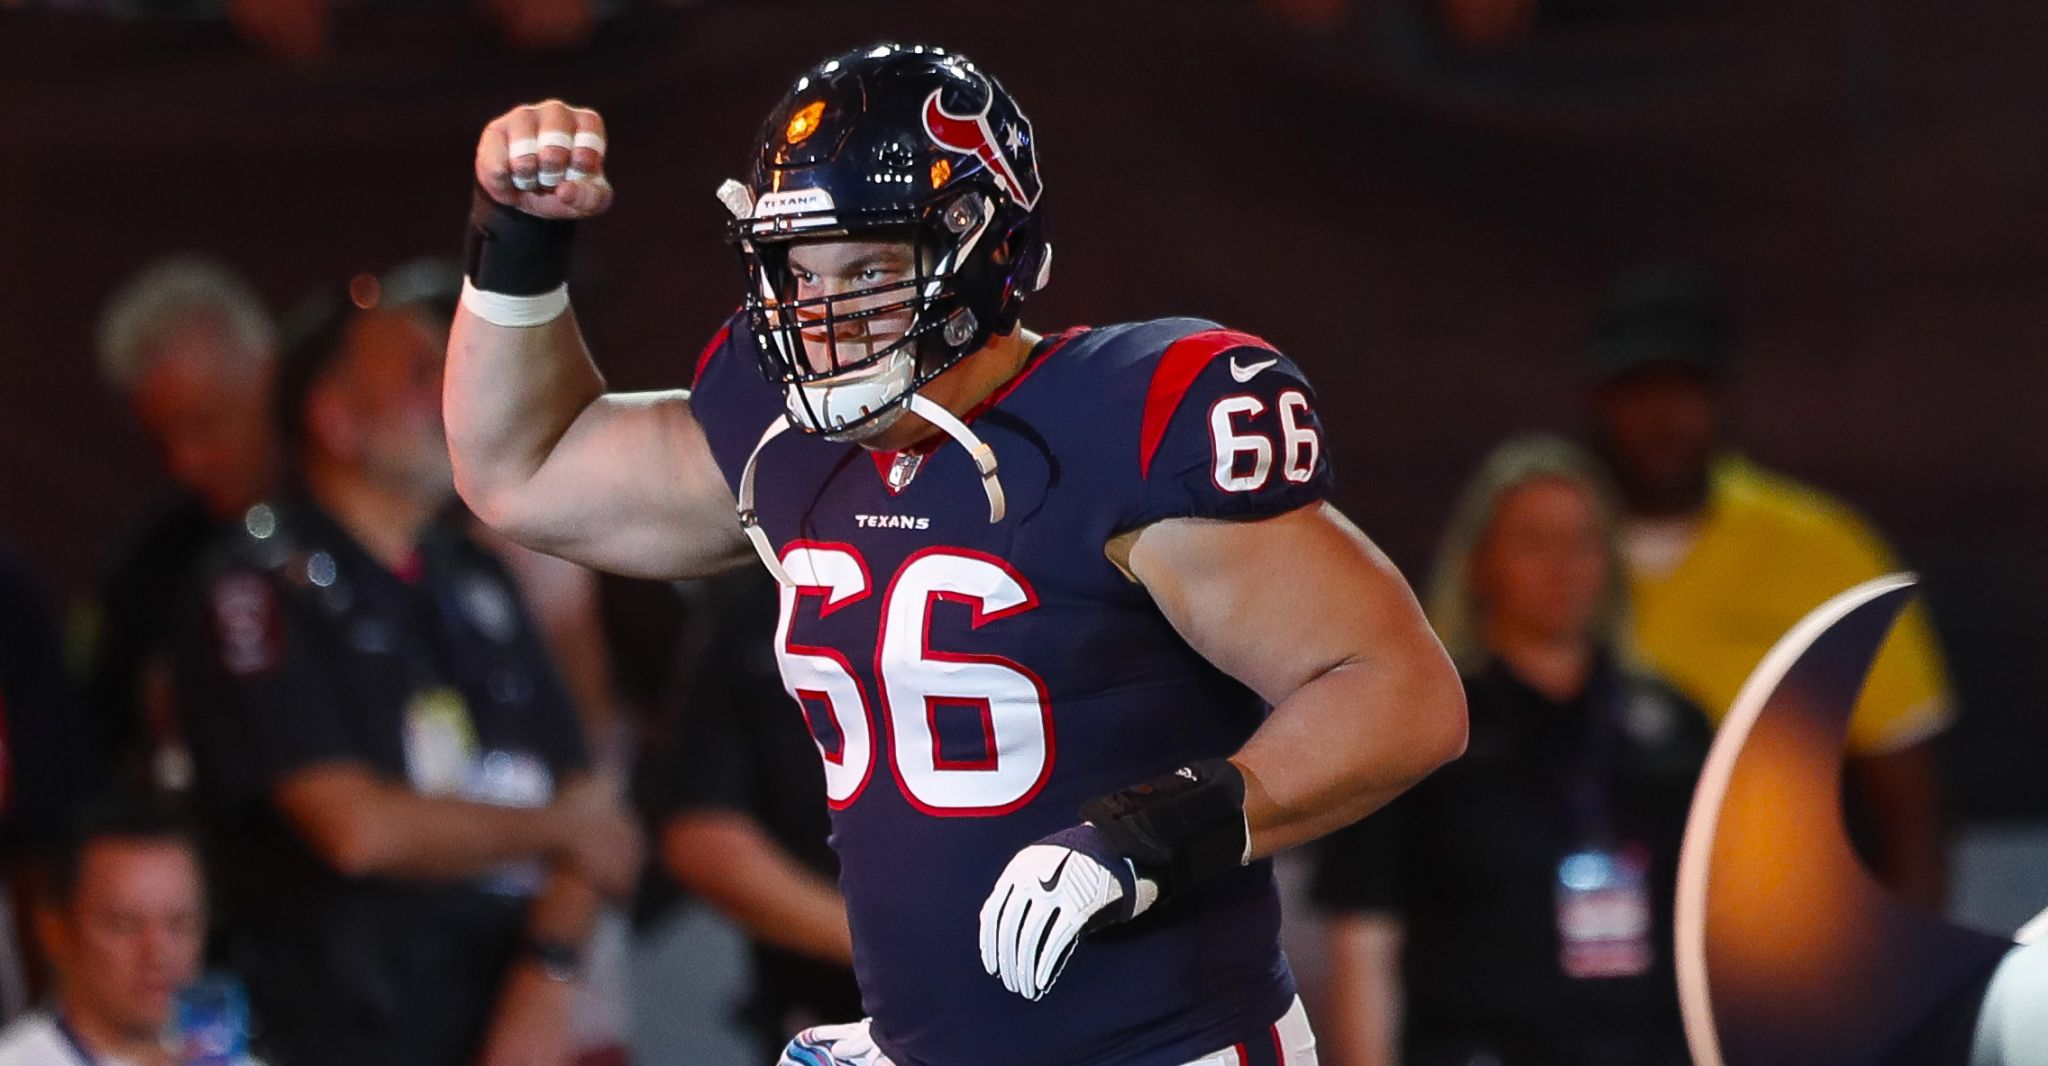 Rusty return for Texans center Nick Martin